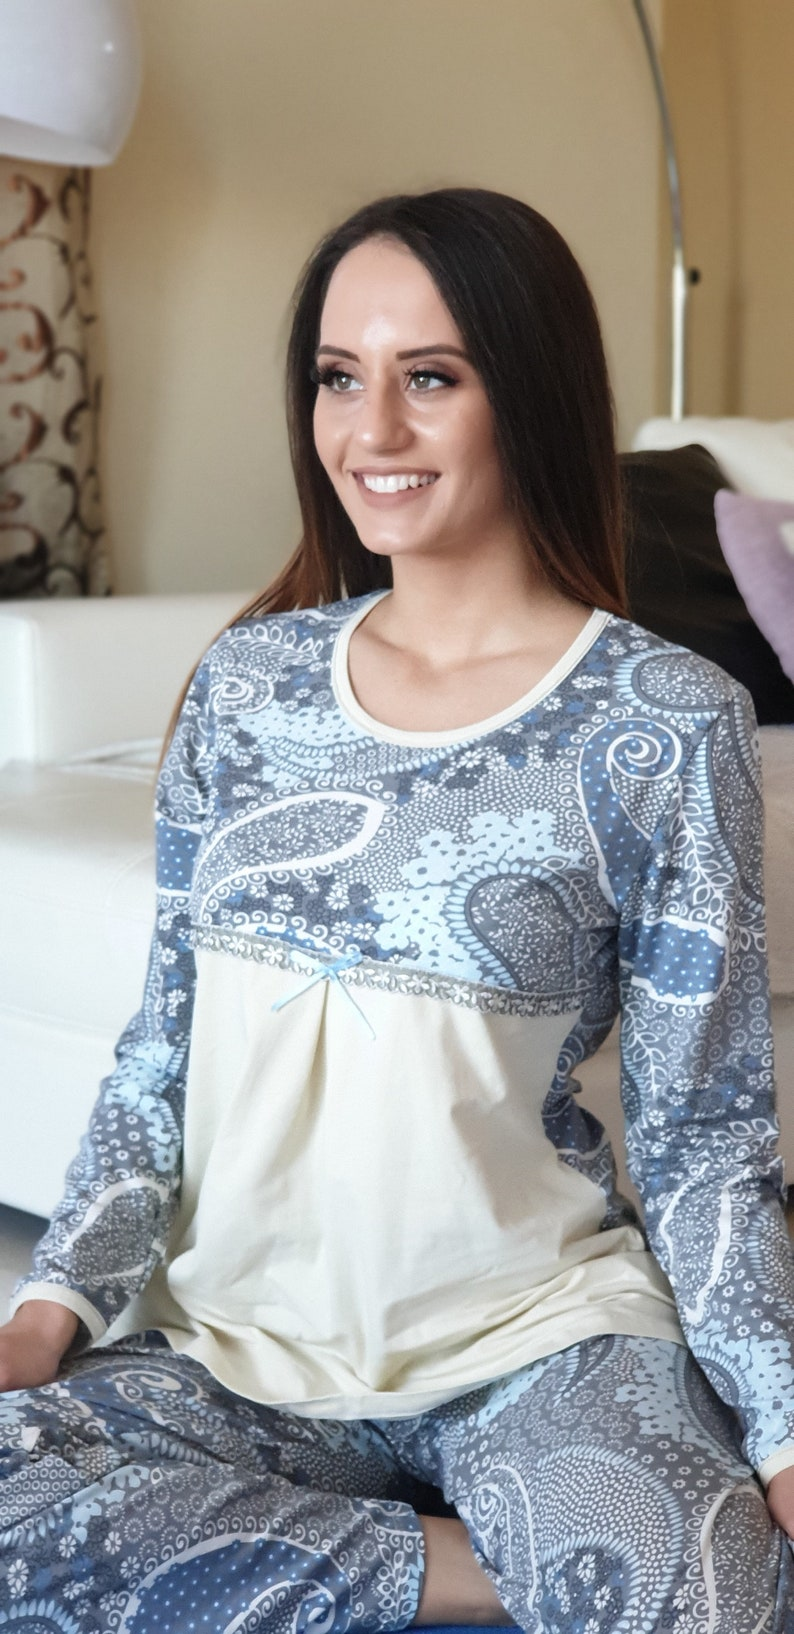 Pajama Party Set Pyjama Set for Classy Look Comfort Sleeping in Romantic Look Beautiful Soft Cotton Pajama